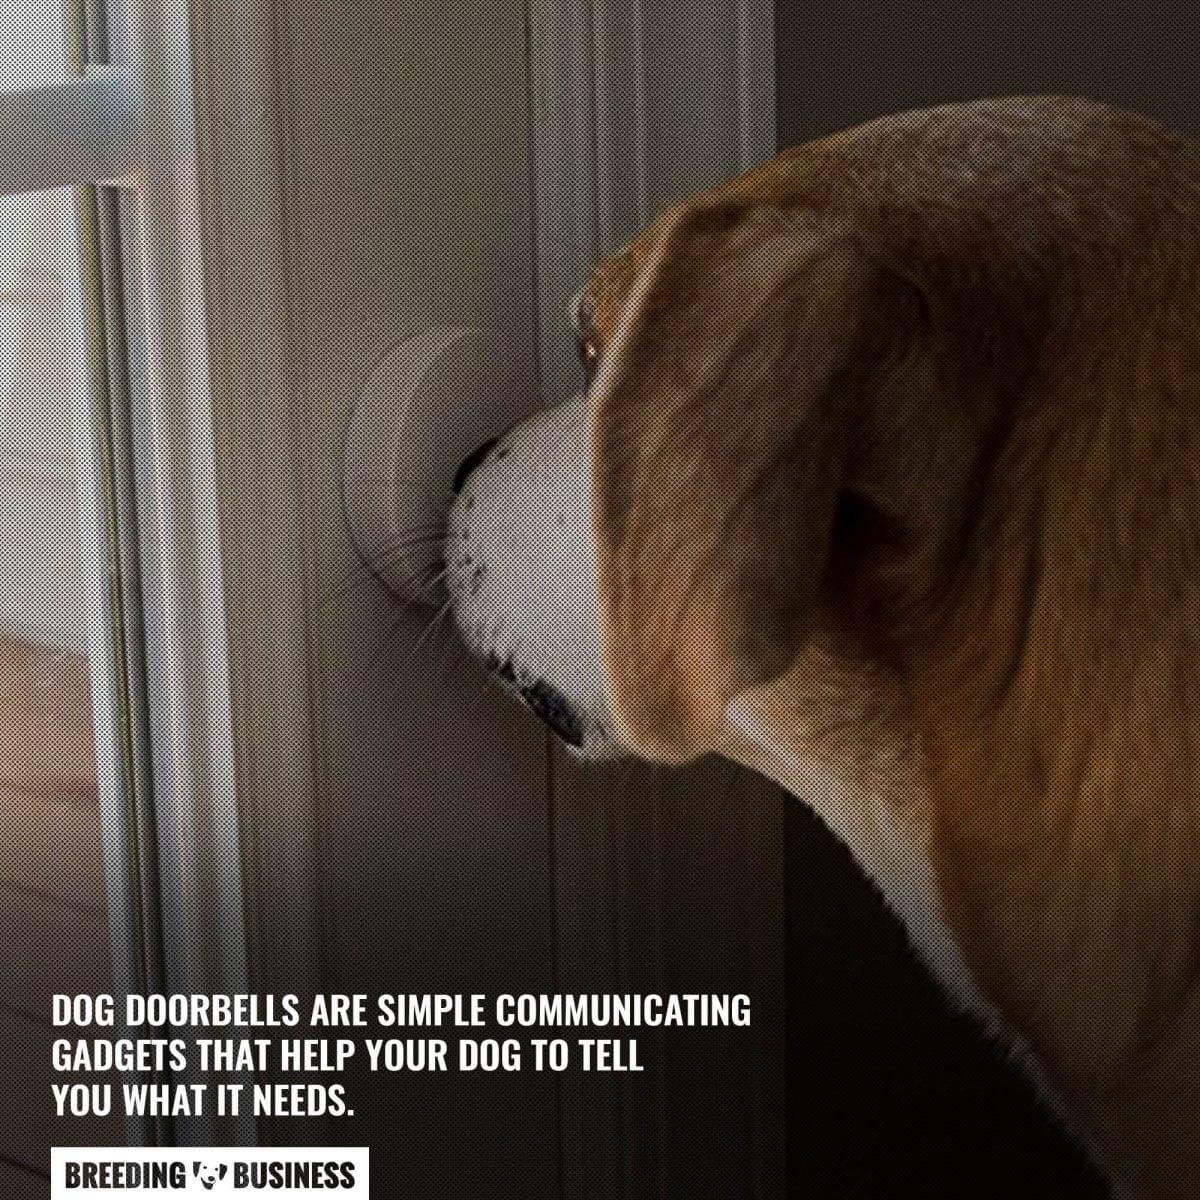 dog doorbells for communicating